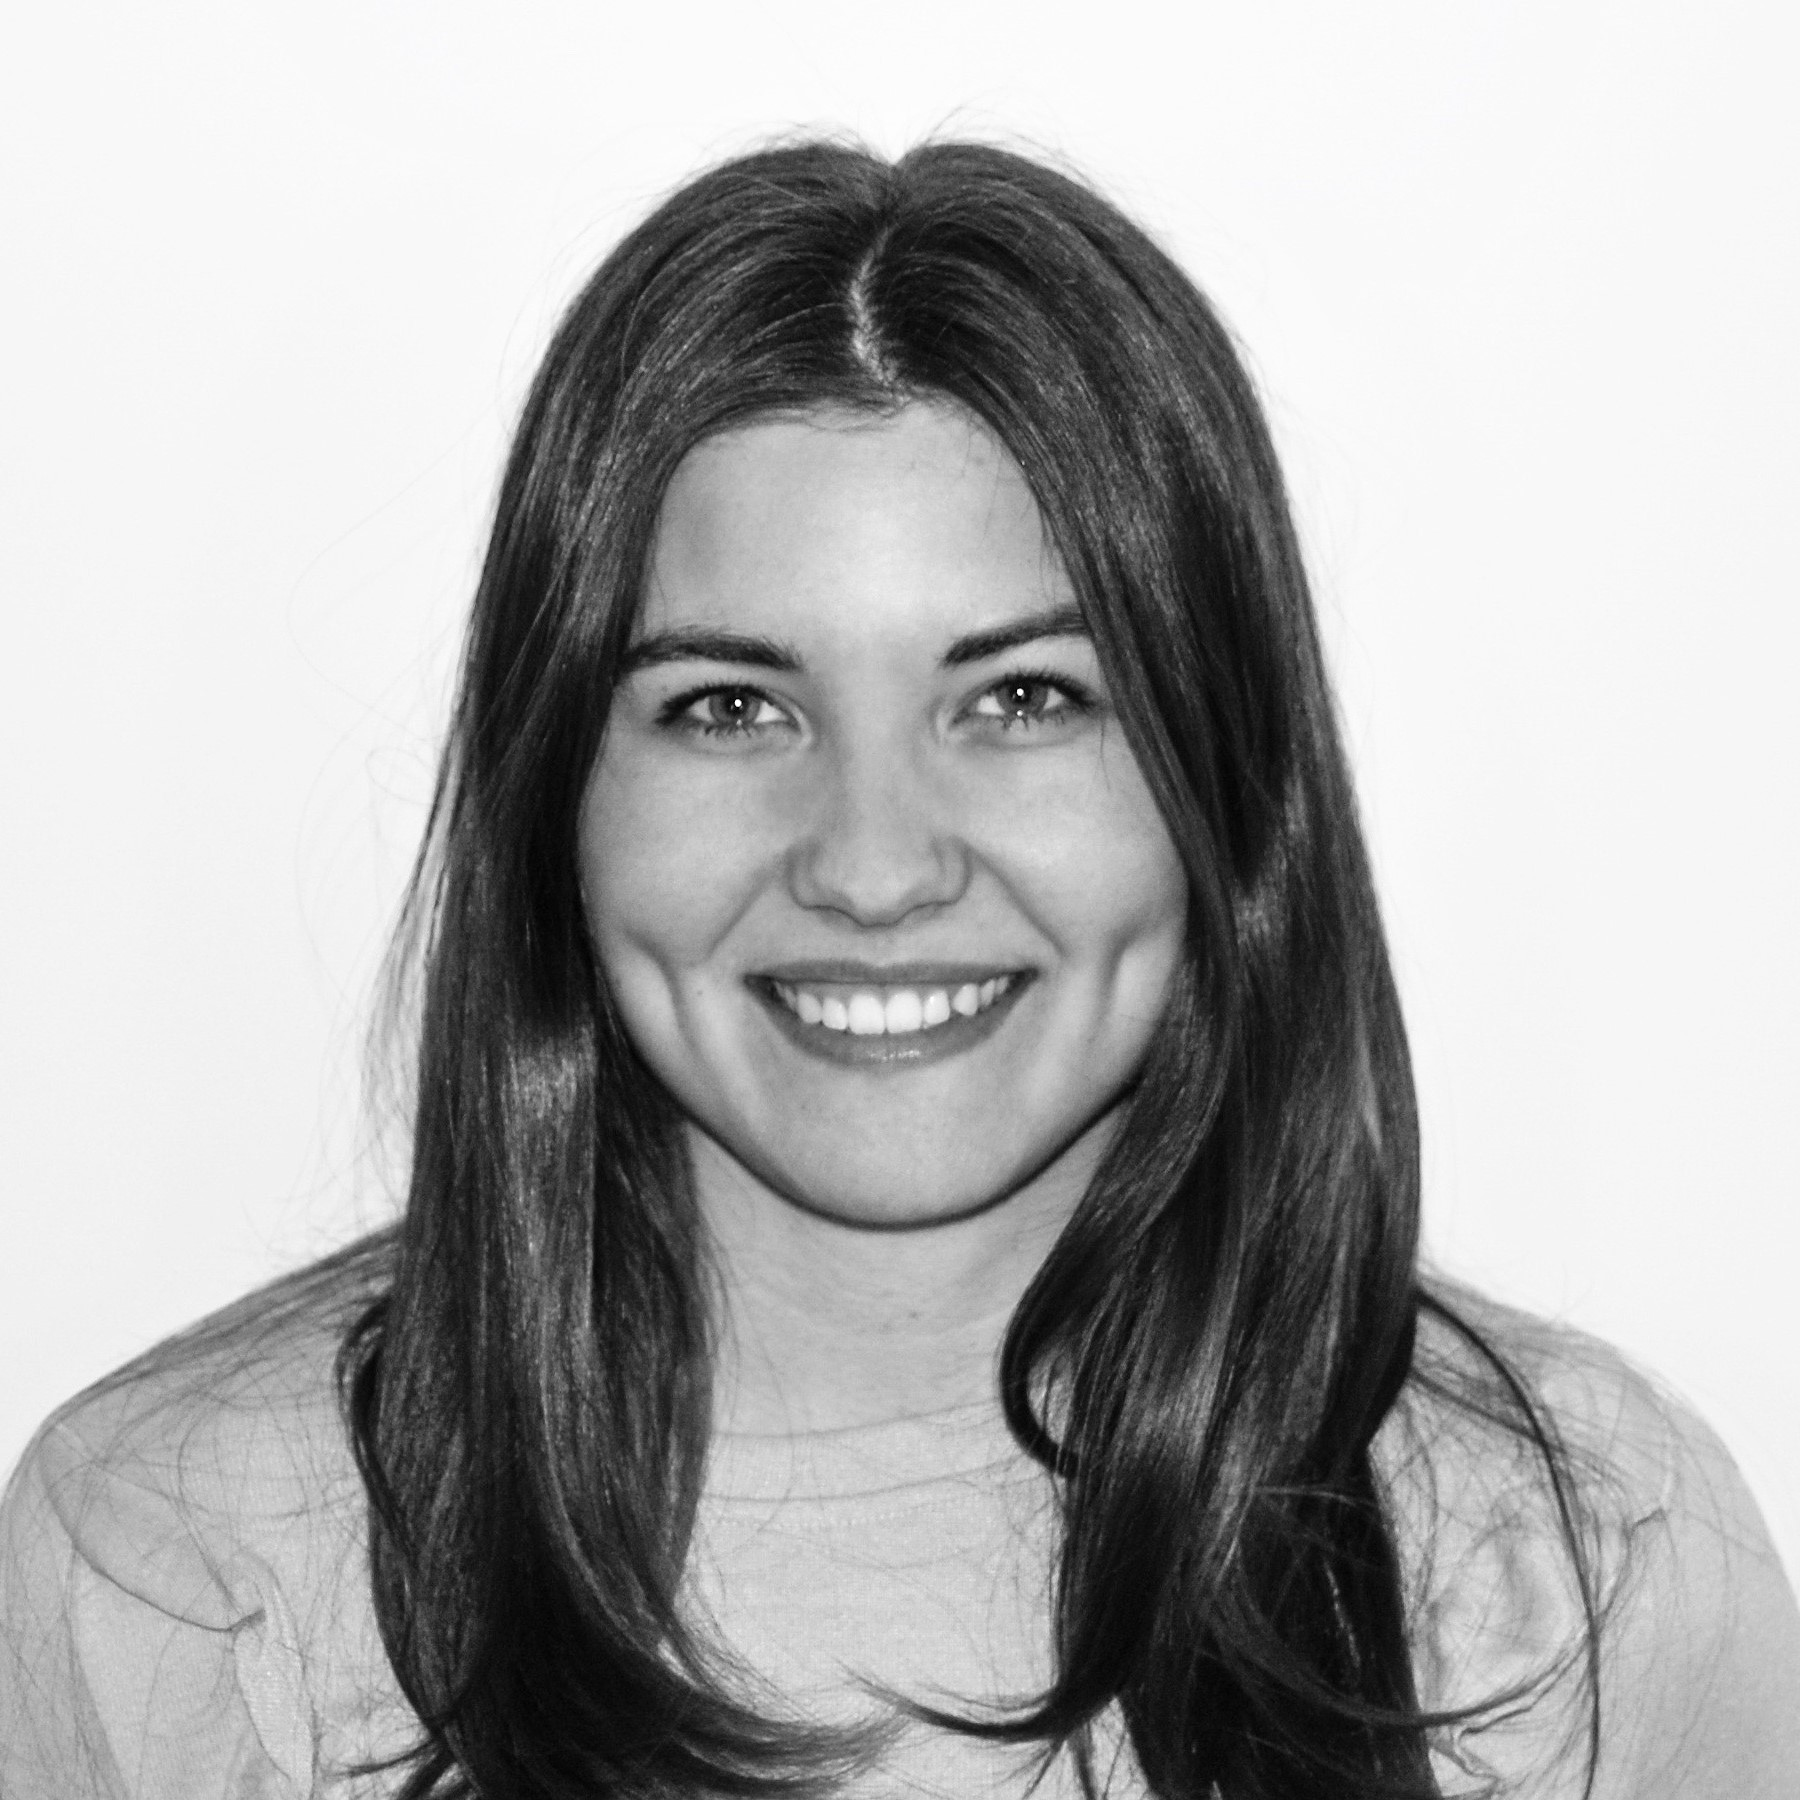 Louise Möllerström